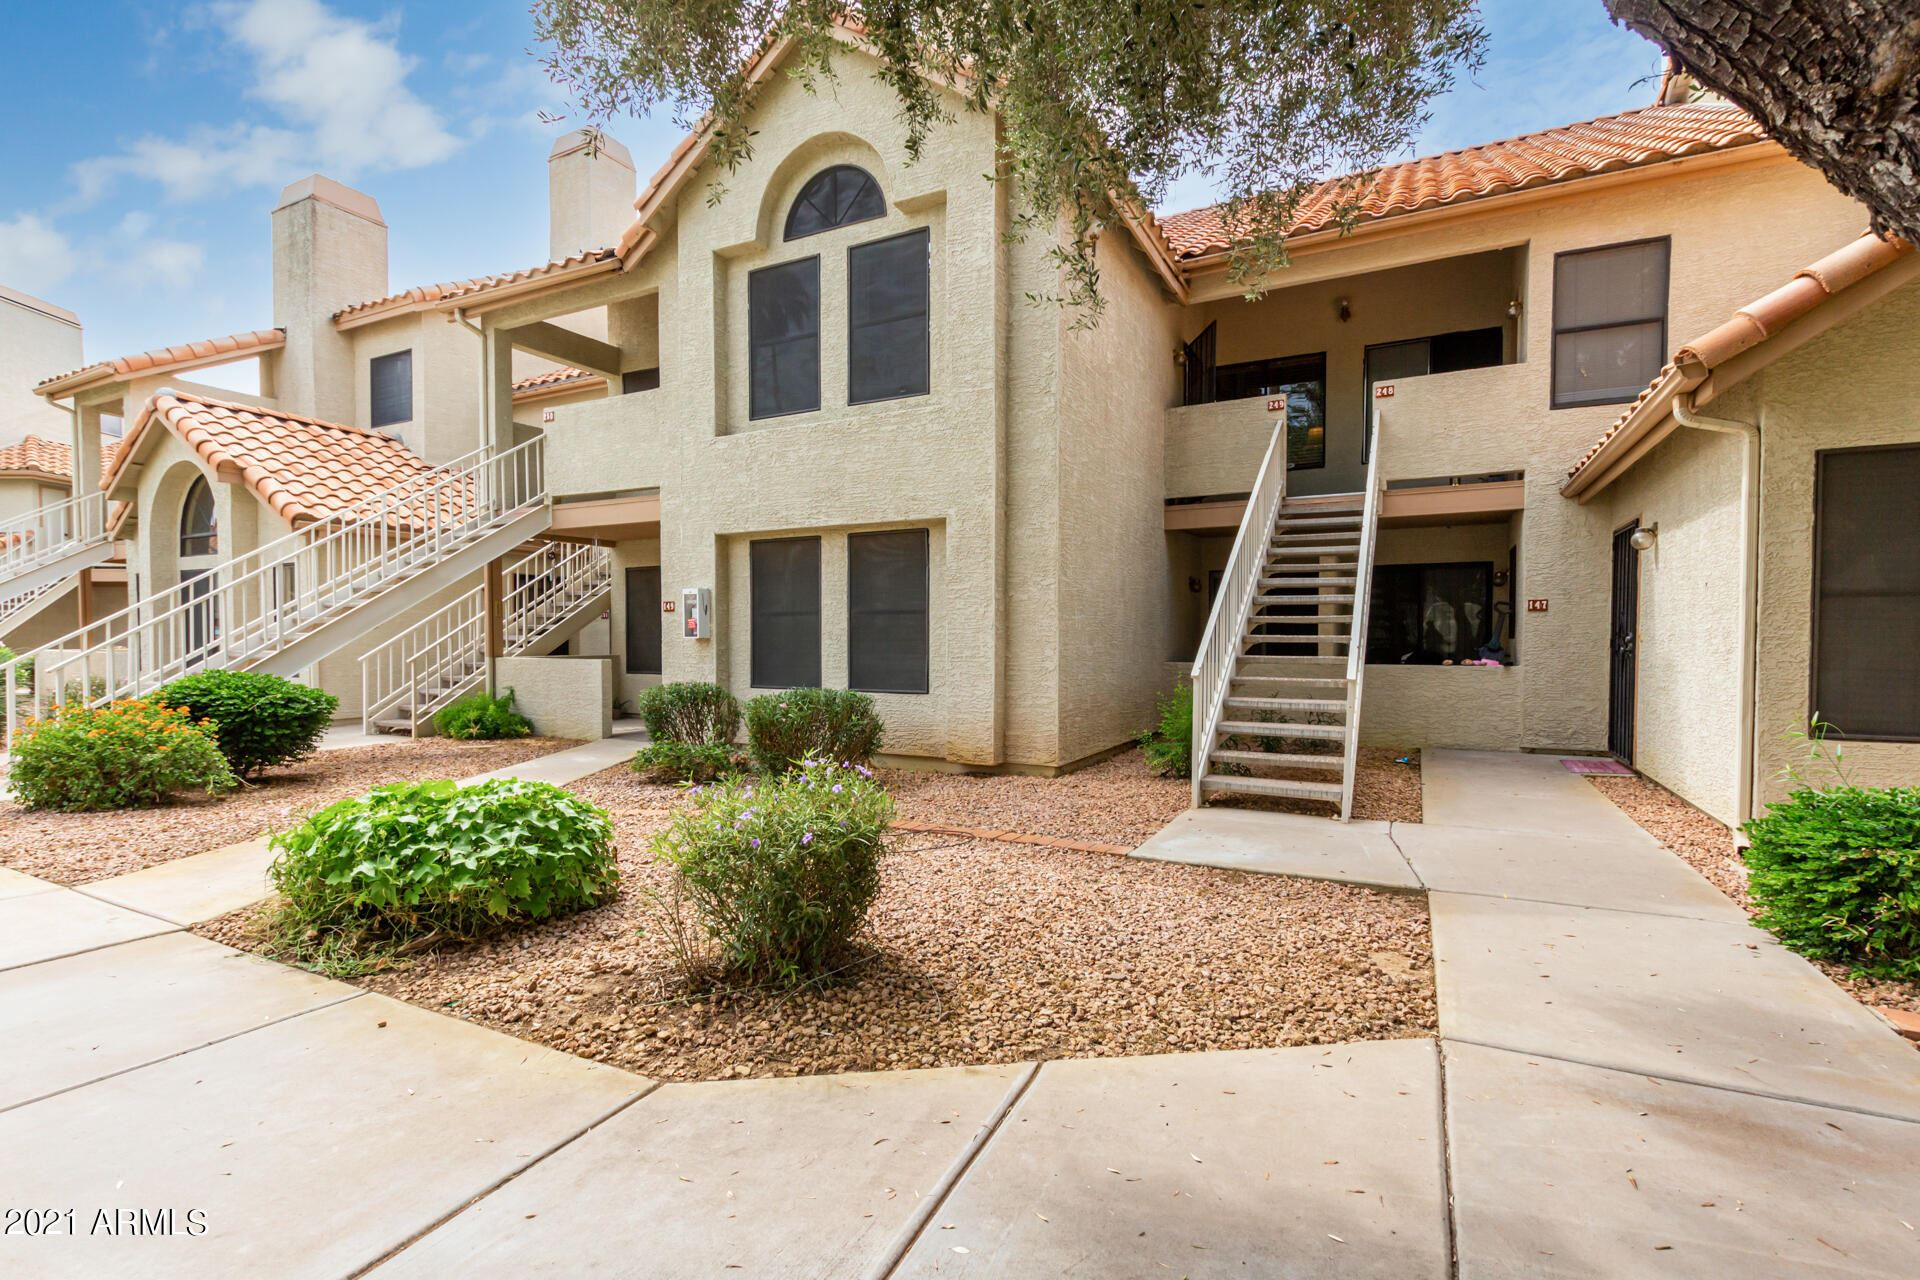 Photo of 19820 N 13TH Avenue #249, Phoenix, AZ 85027 (MLS # 6296481)